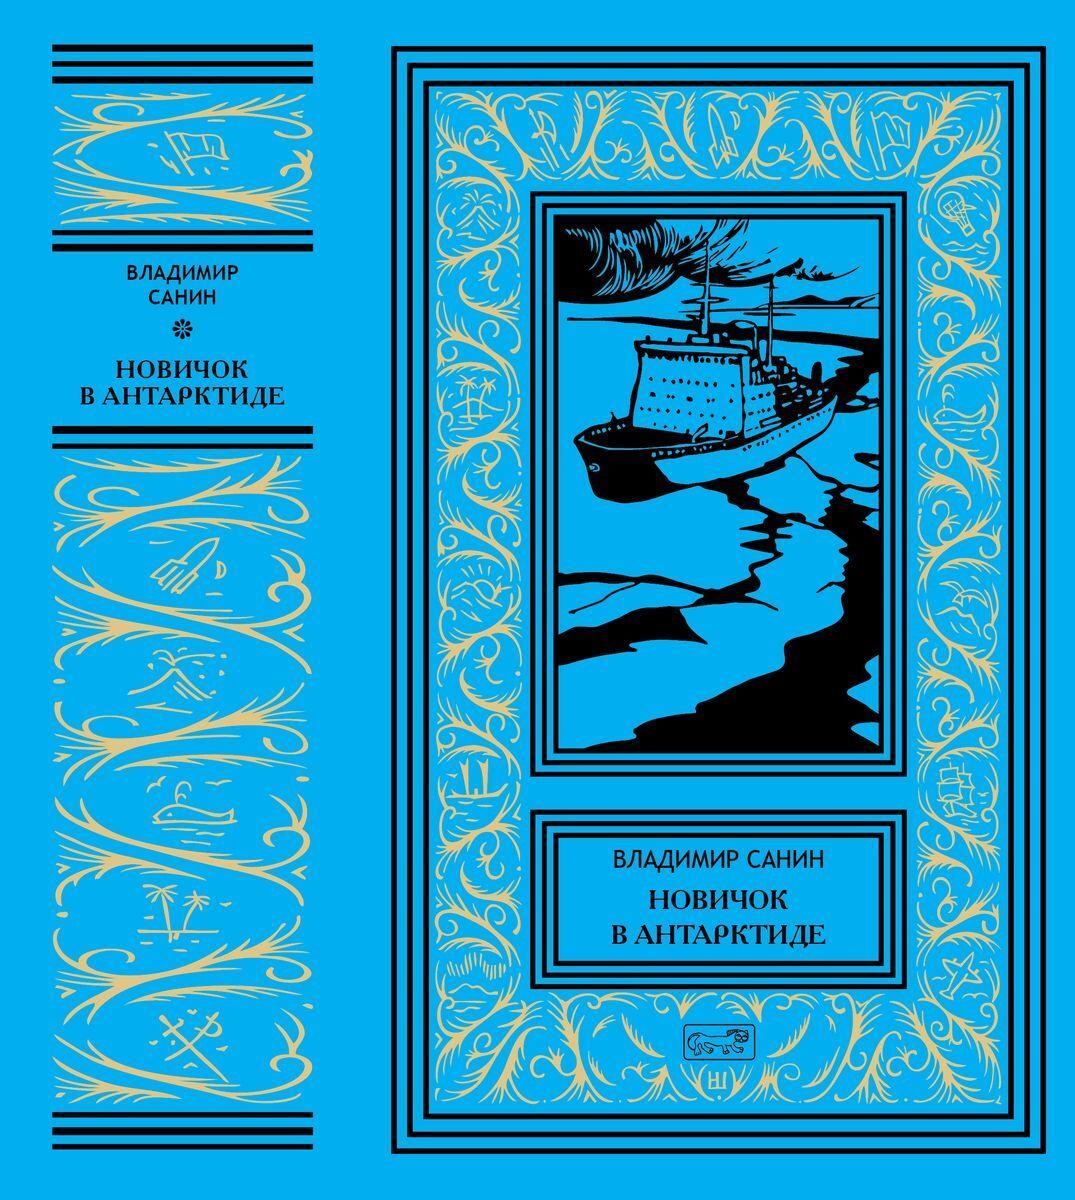 Новичок в Антарктиде | Санин Владимир Маркович #1